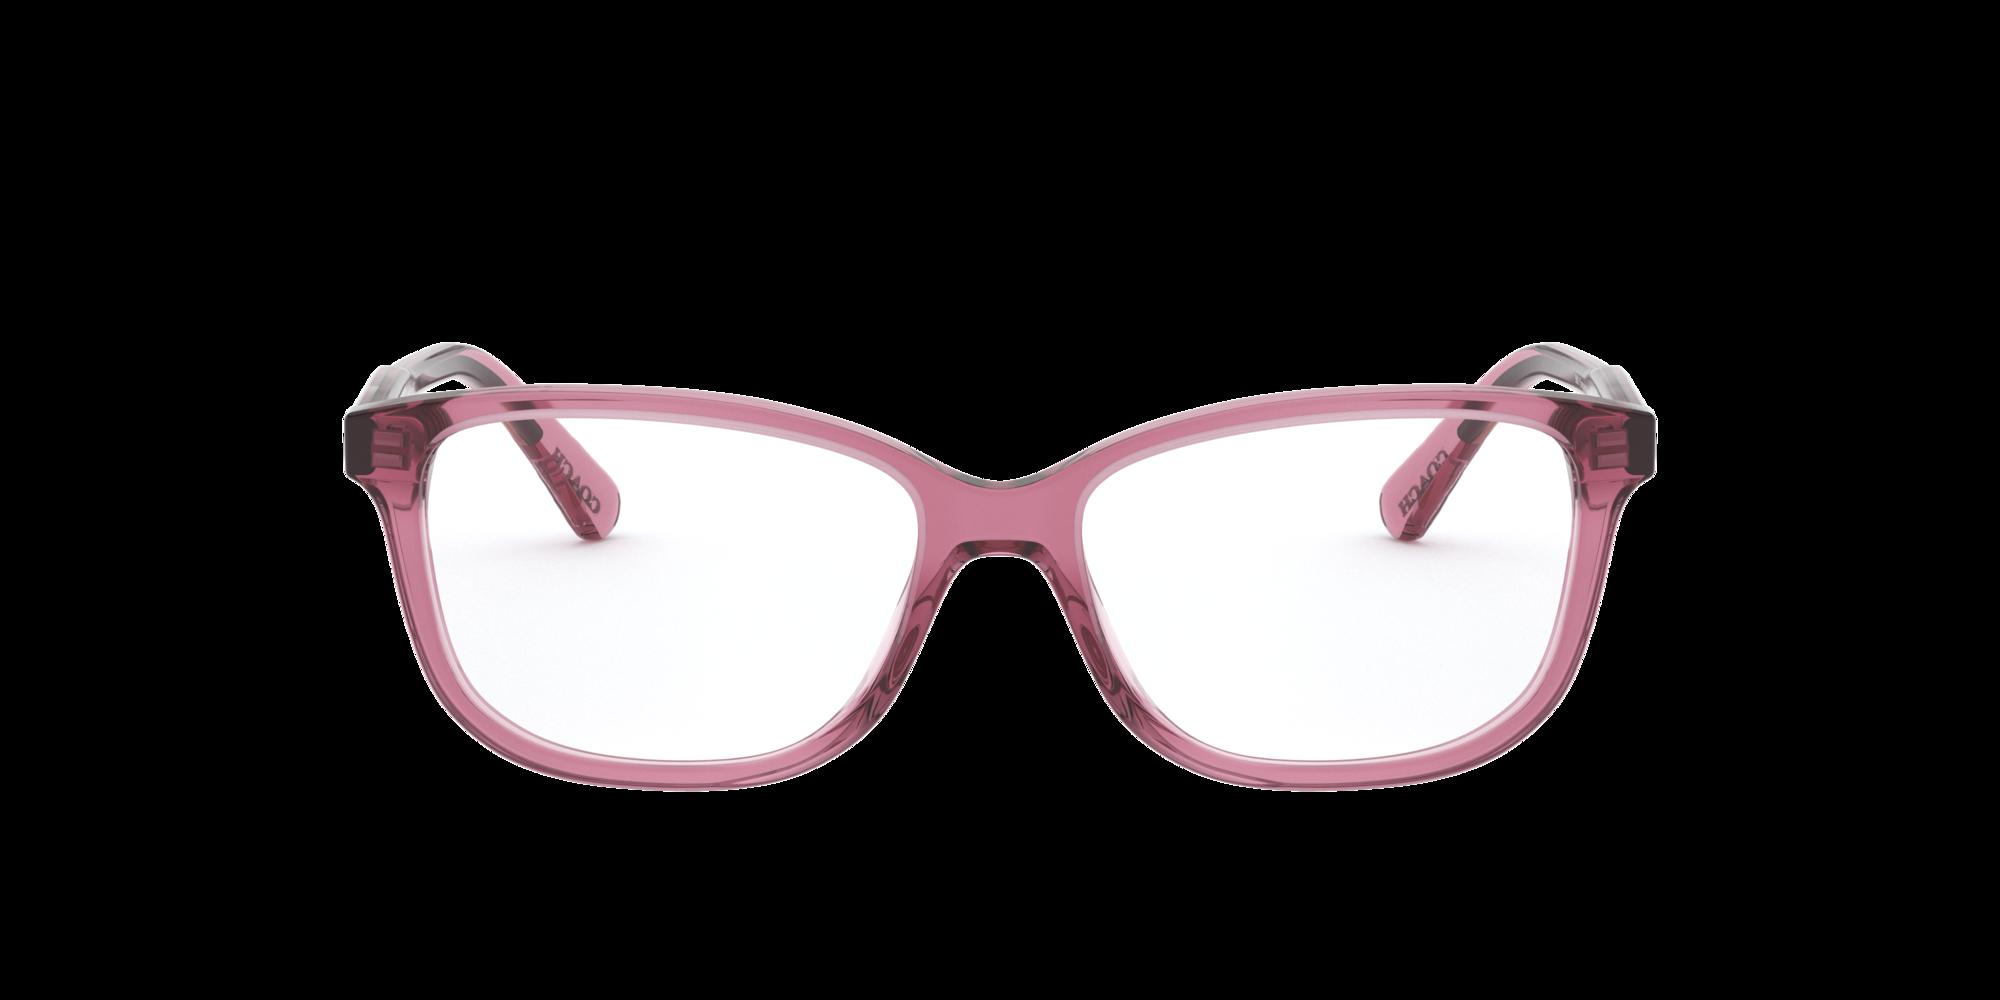 Image for HC6143 from LensCrafters | Glasses, Prescription Glasses Online, Eyewear